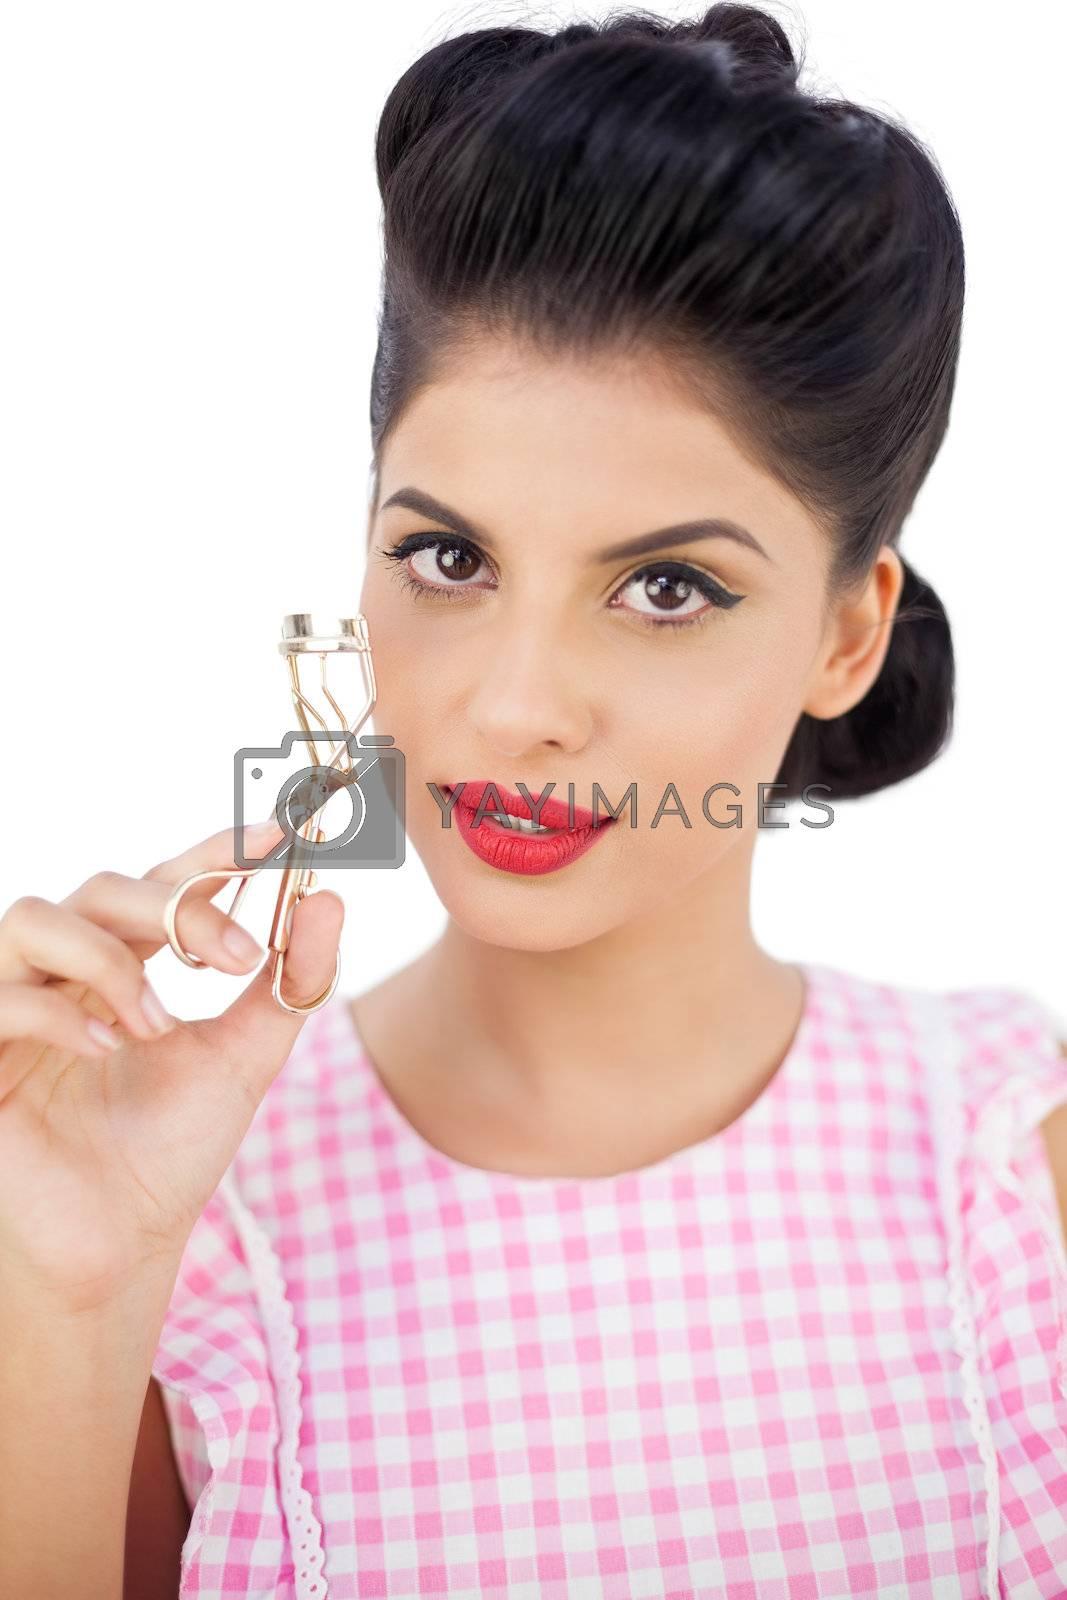 Attractive black hair model holding an eyelash curler by Wavebreakmedia